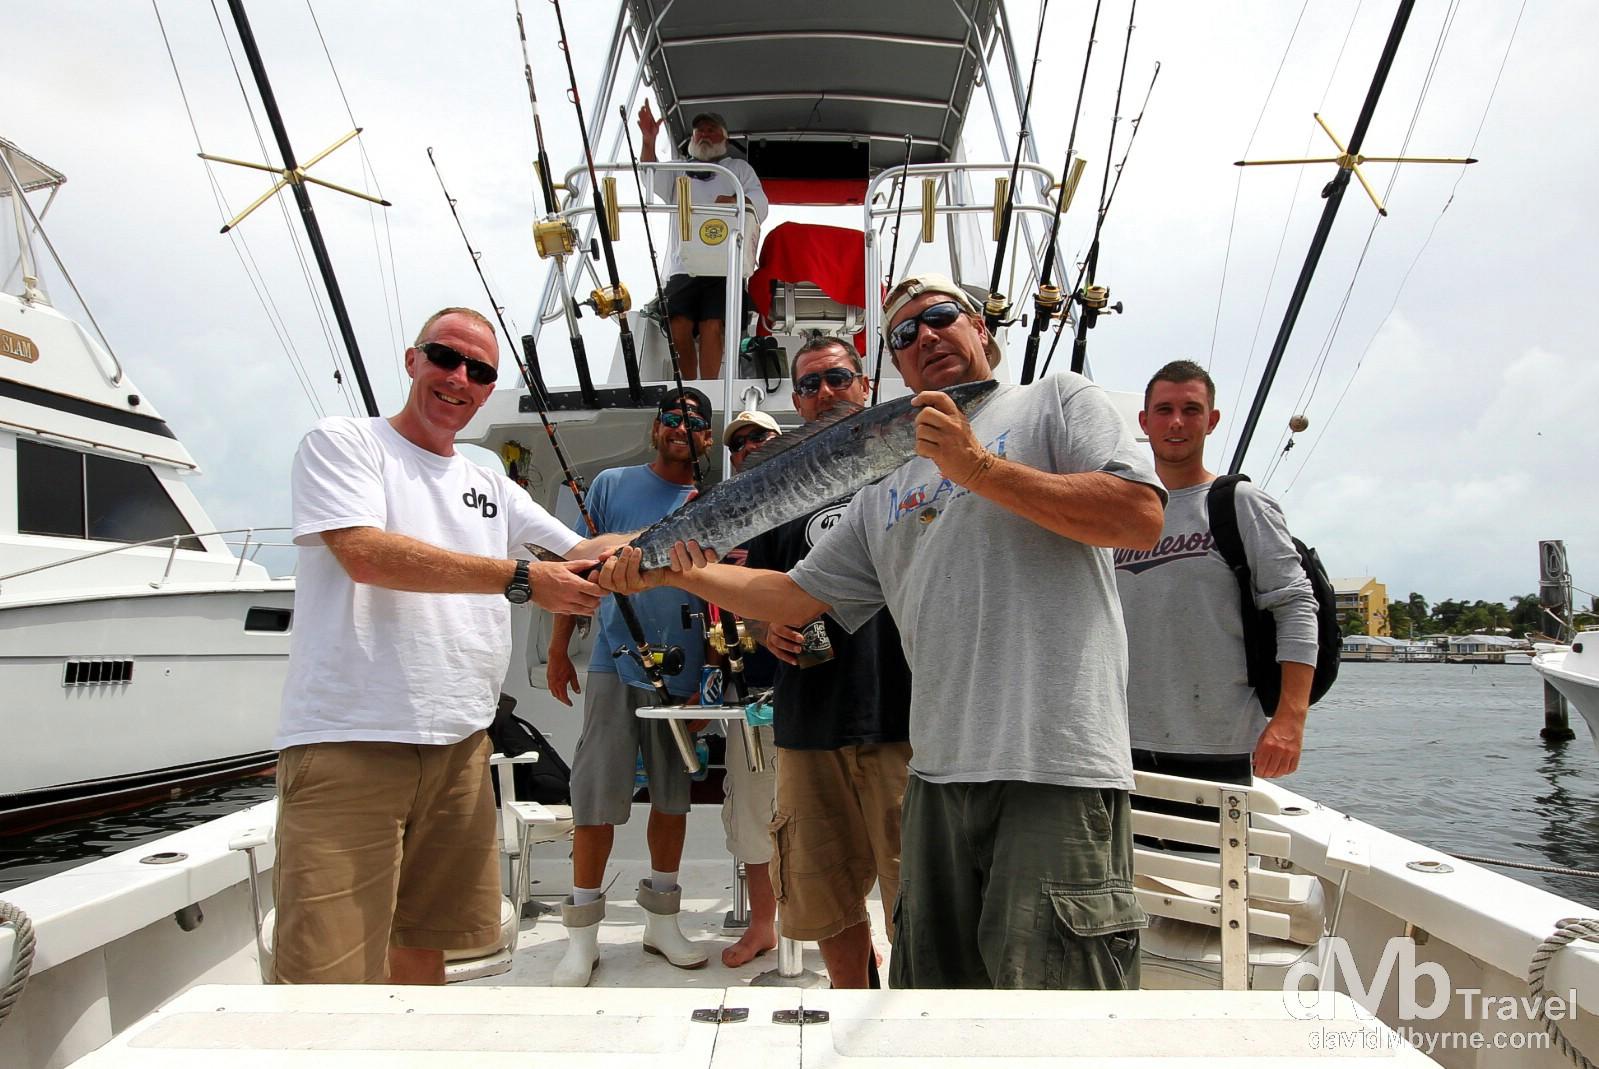 A fruitful days fishing off the Florida Keys. Key West, Florida, USA. July 5th 2013.